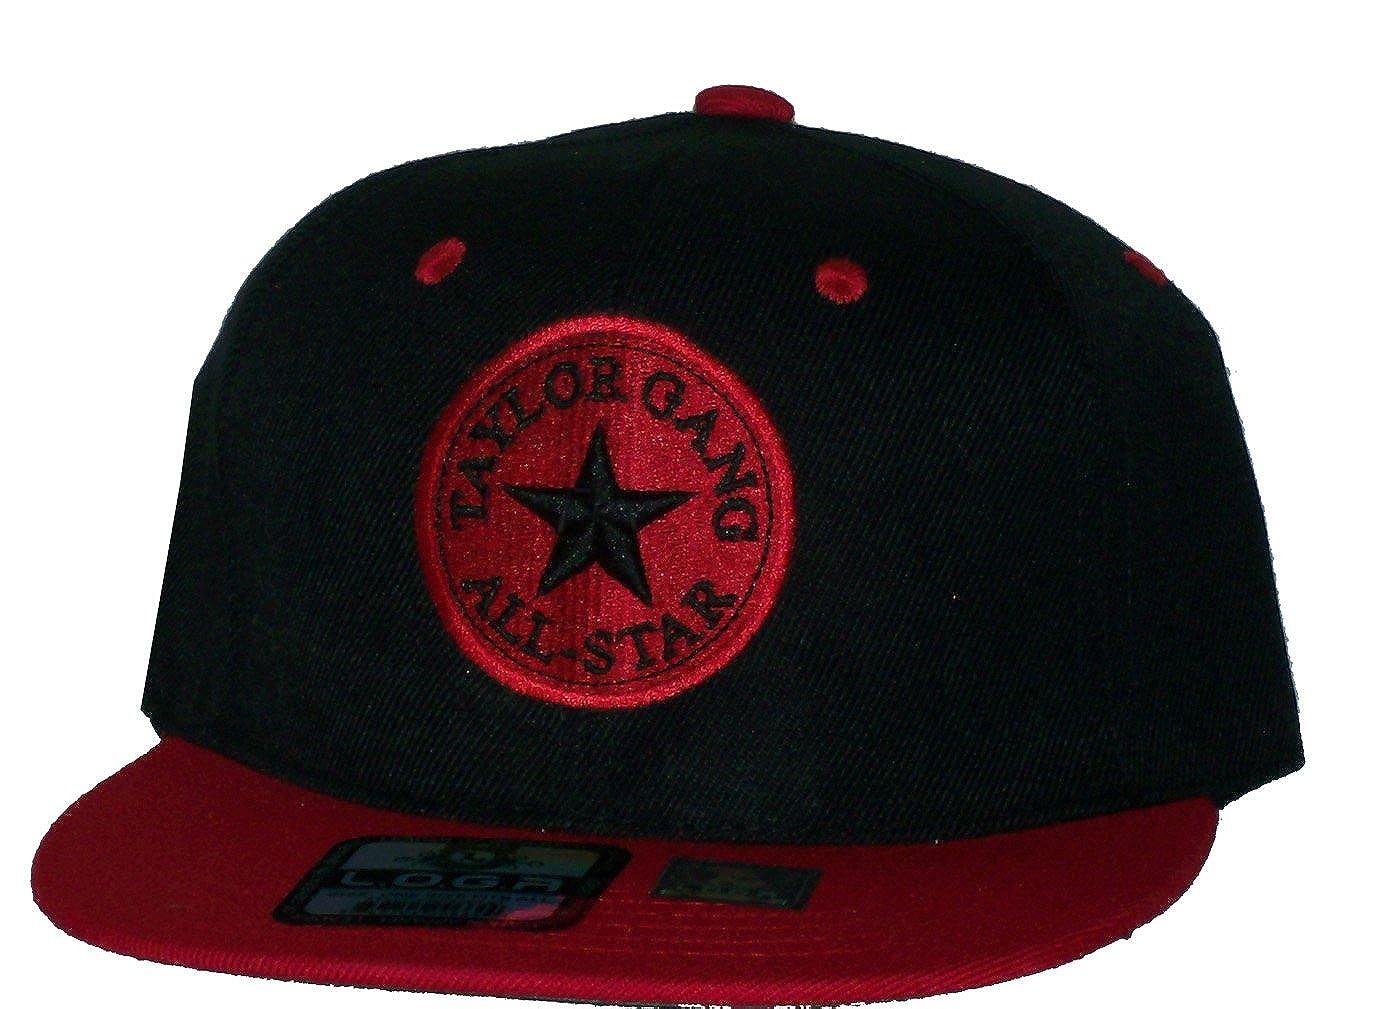 Amazon.com  Rob sTees Taylor Gang All Star Black Red Wiz Khalifa Snapback Hat  Cap  Clothing 85238c85b25